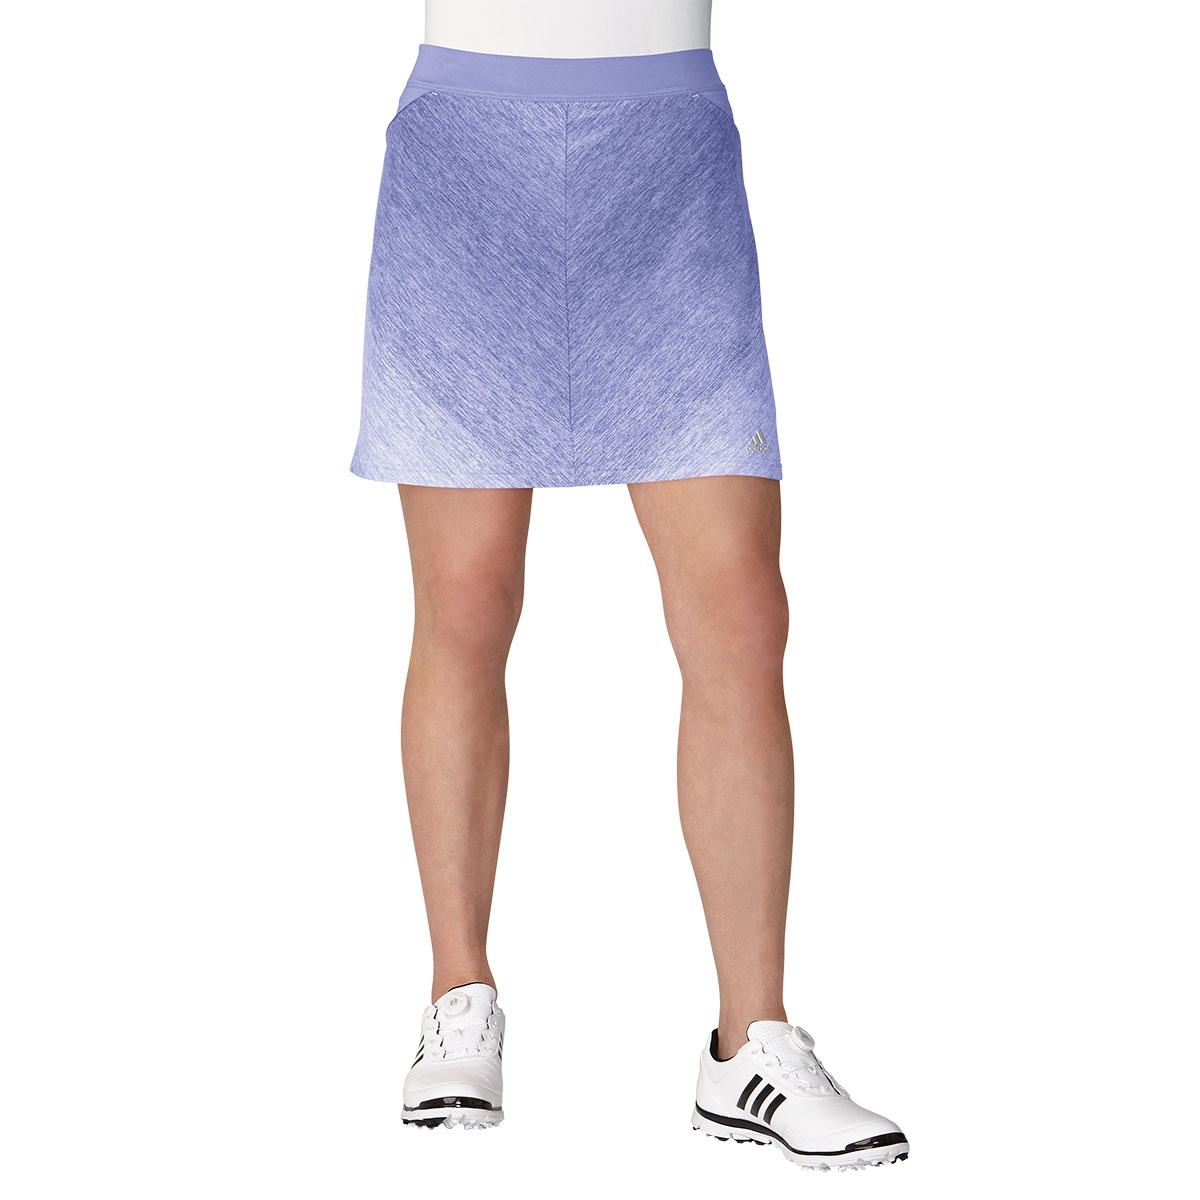 Adidas Womens Rangewear A Line Skort - Purple